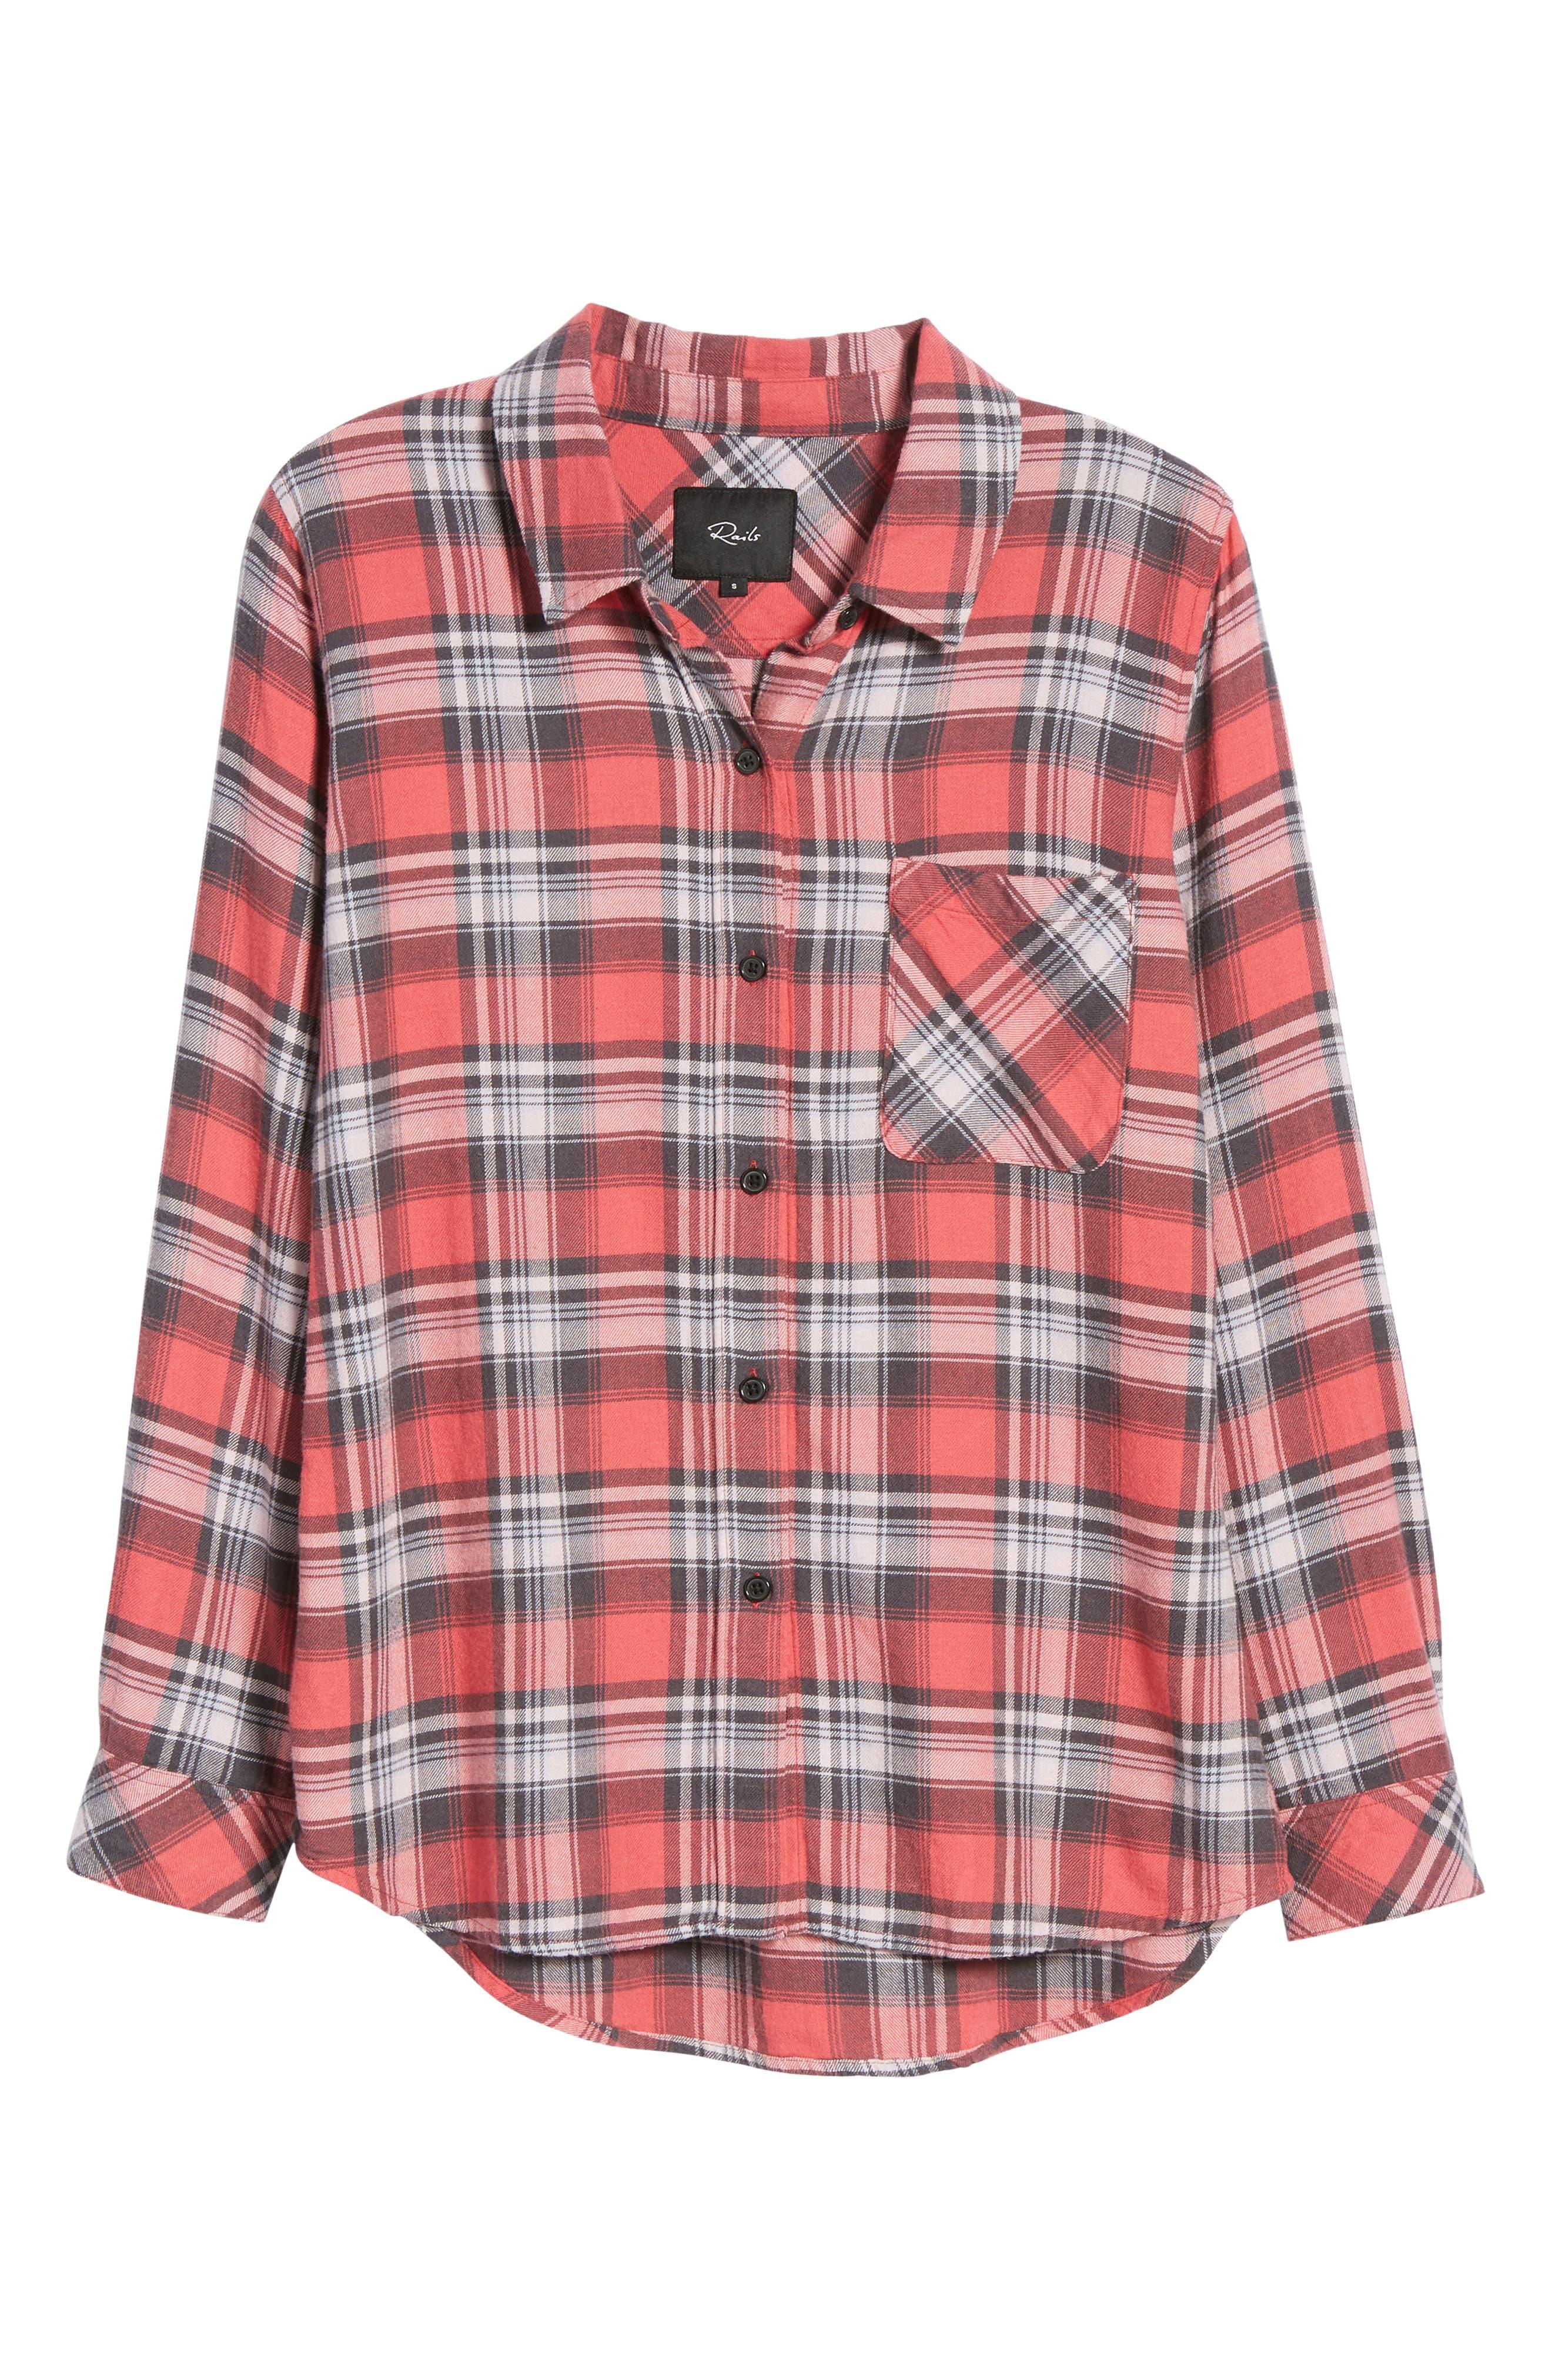 Milo Plaid Shirt,                             Alternate thumbnail 6, color,                             BONFIRE/ ASH